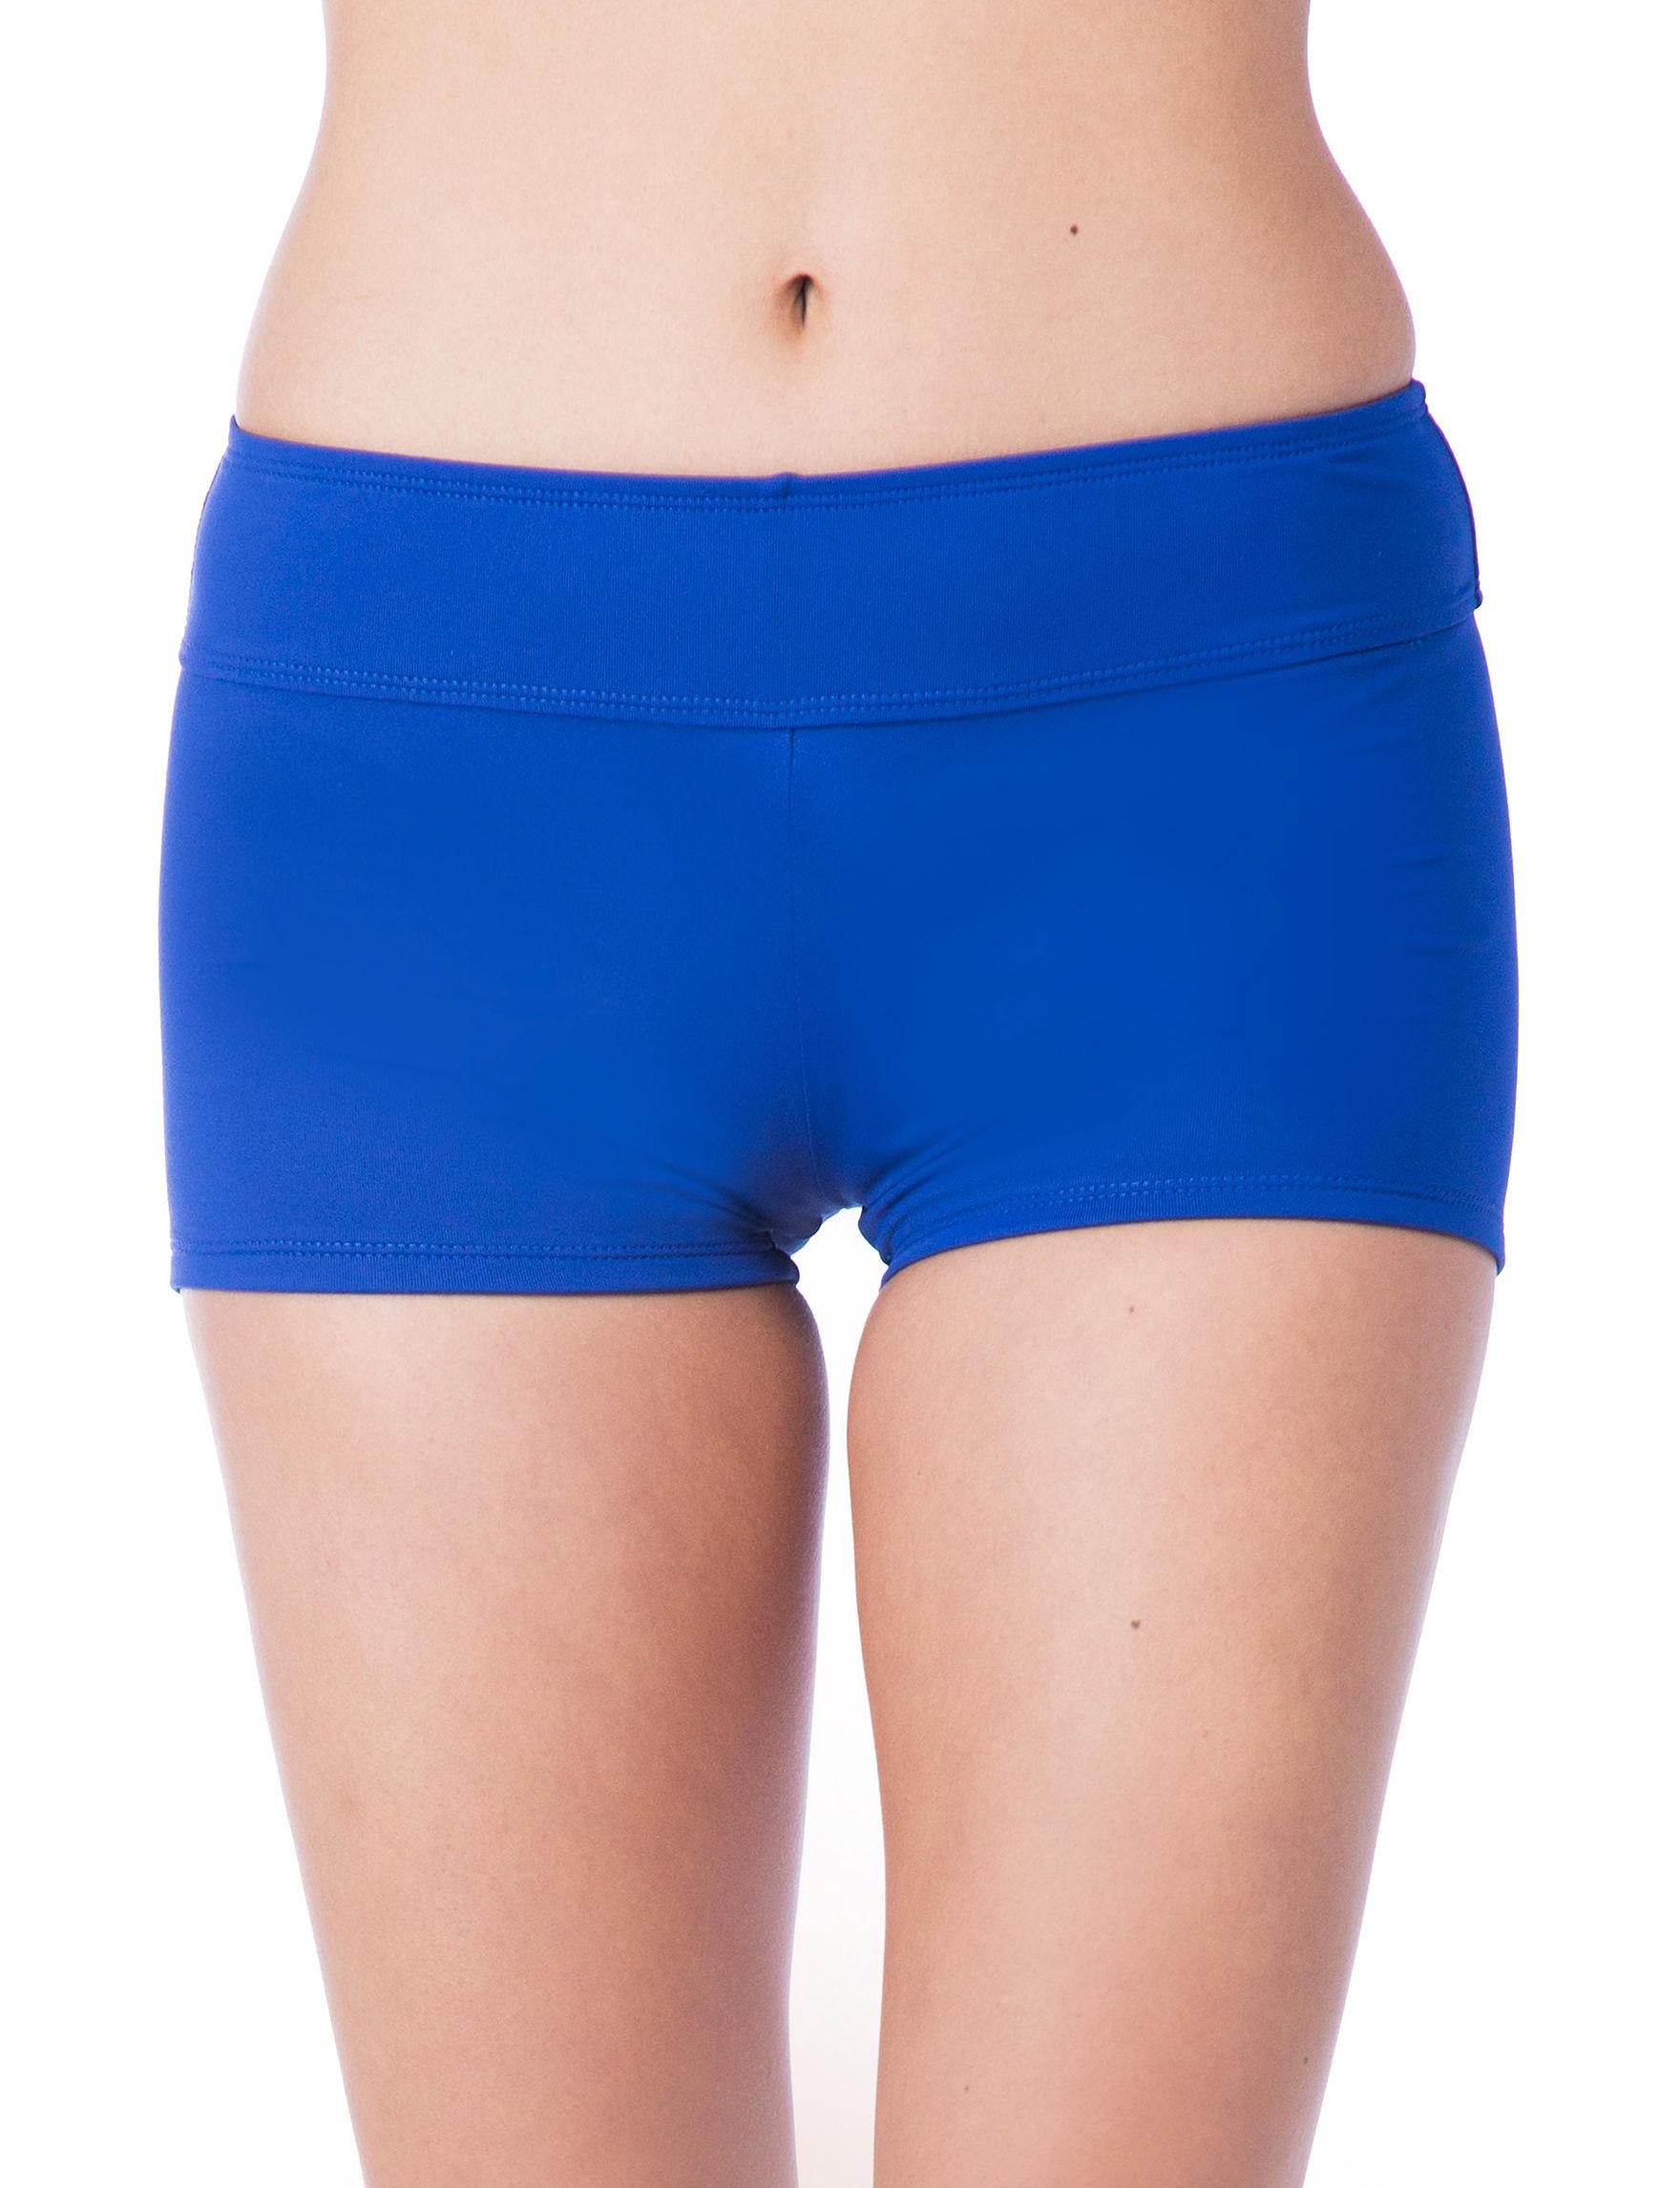 Chaps Royal Blue Swimsuit Bottoms Boyshort